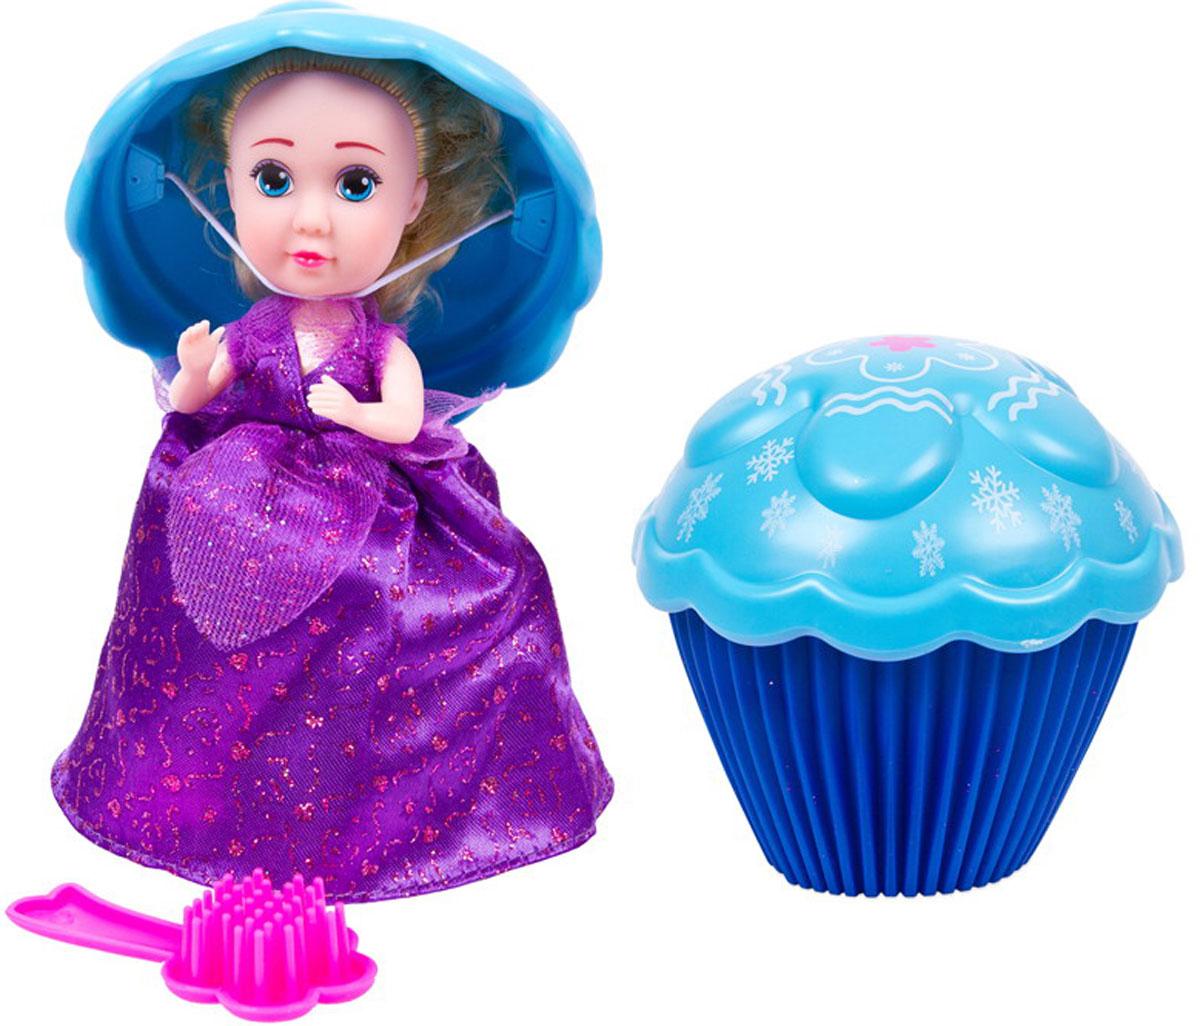 Emco Кукла-кекс Cupcake Surprise Violet